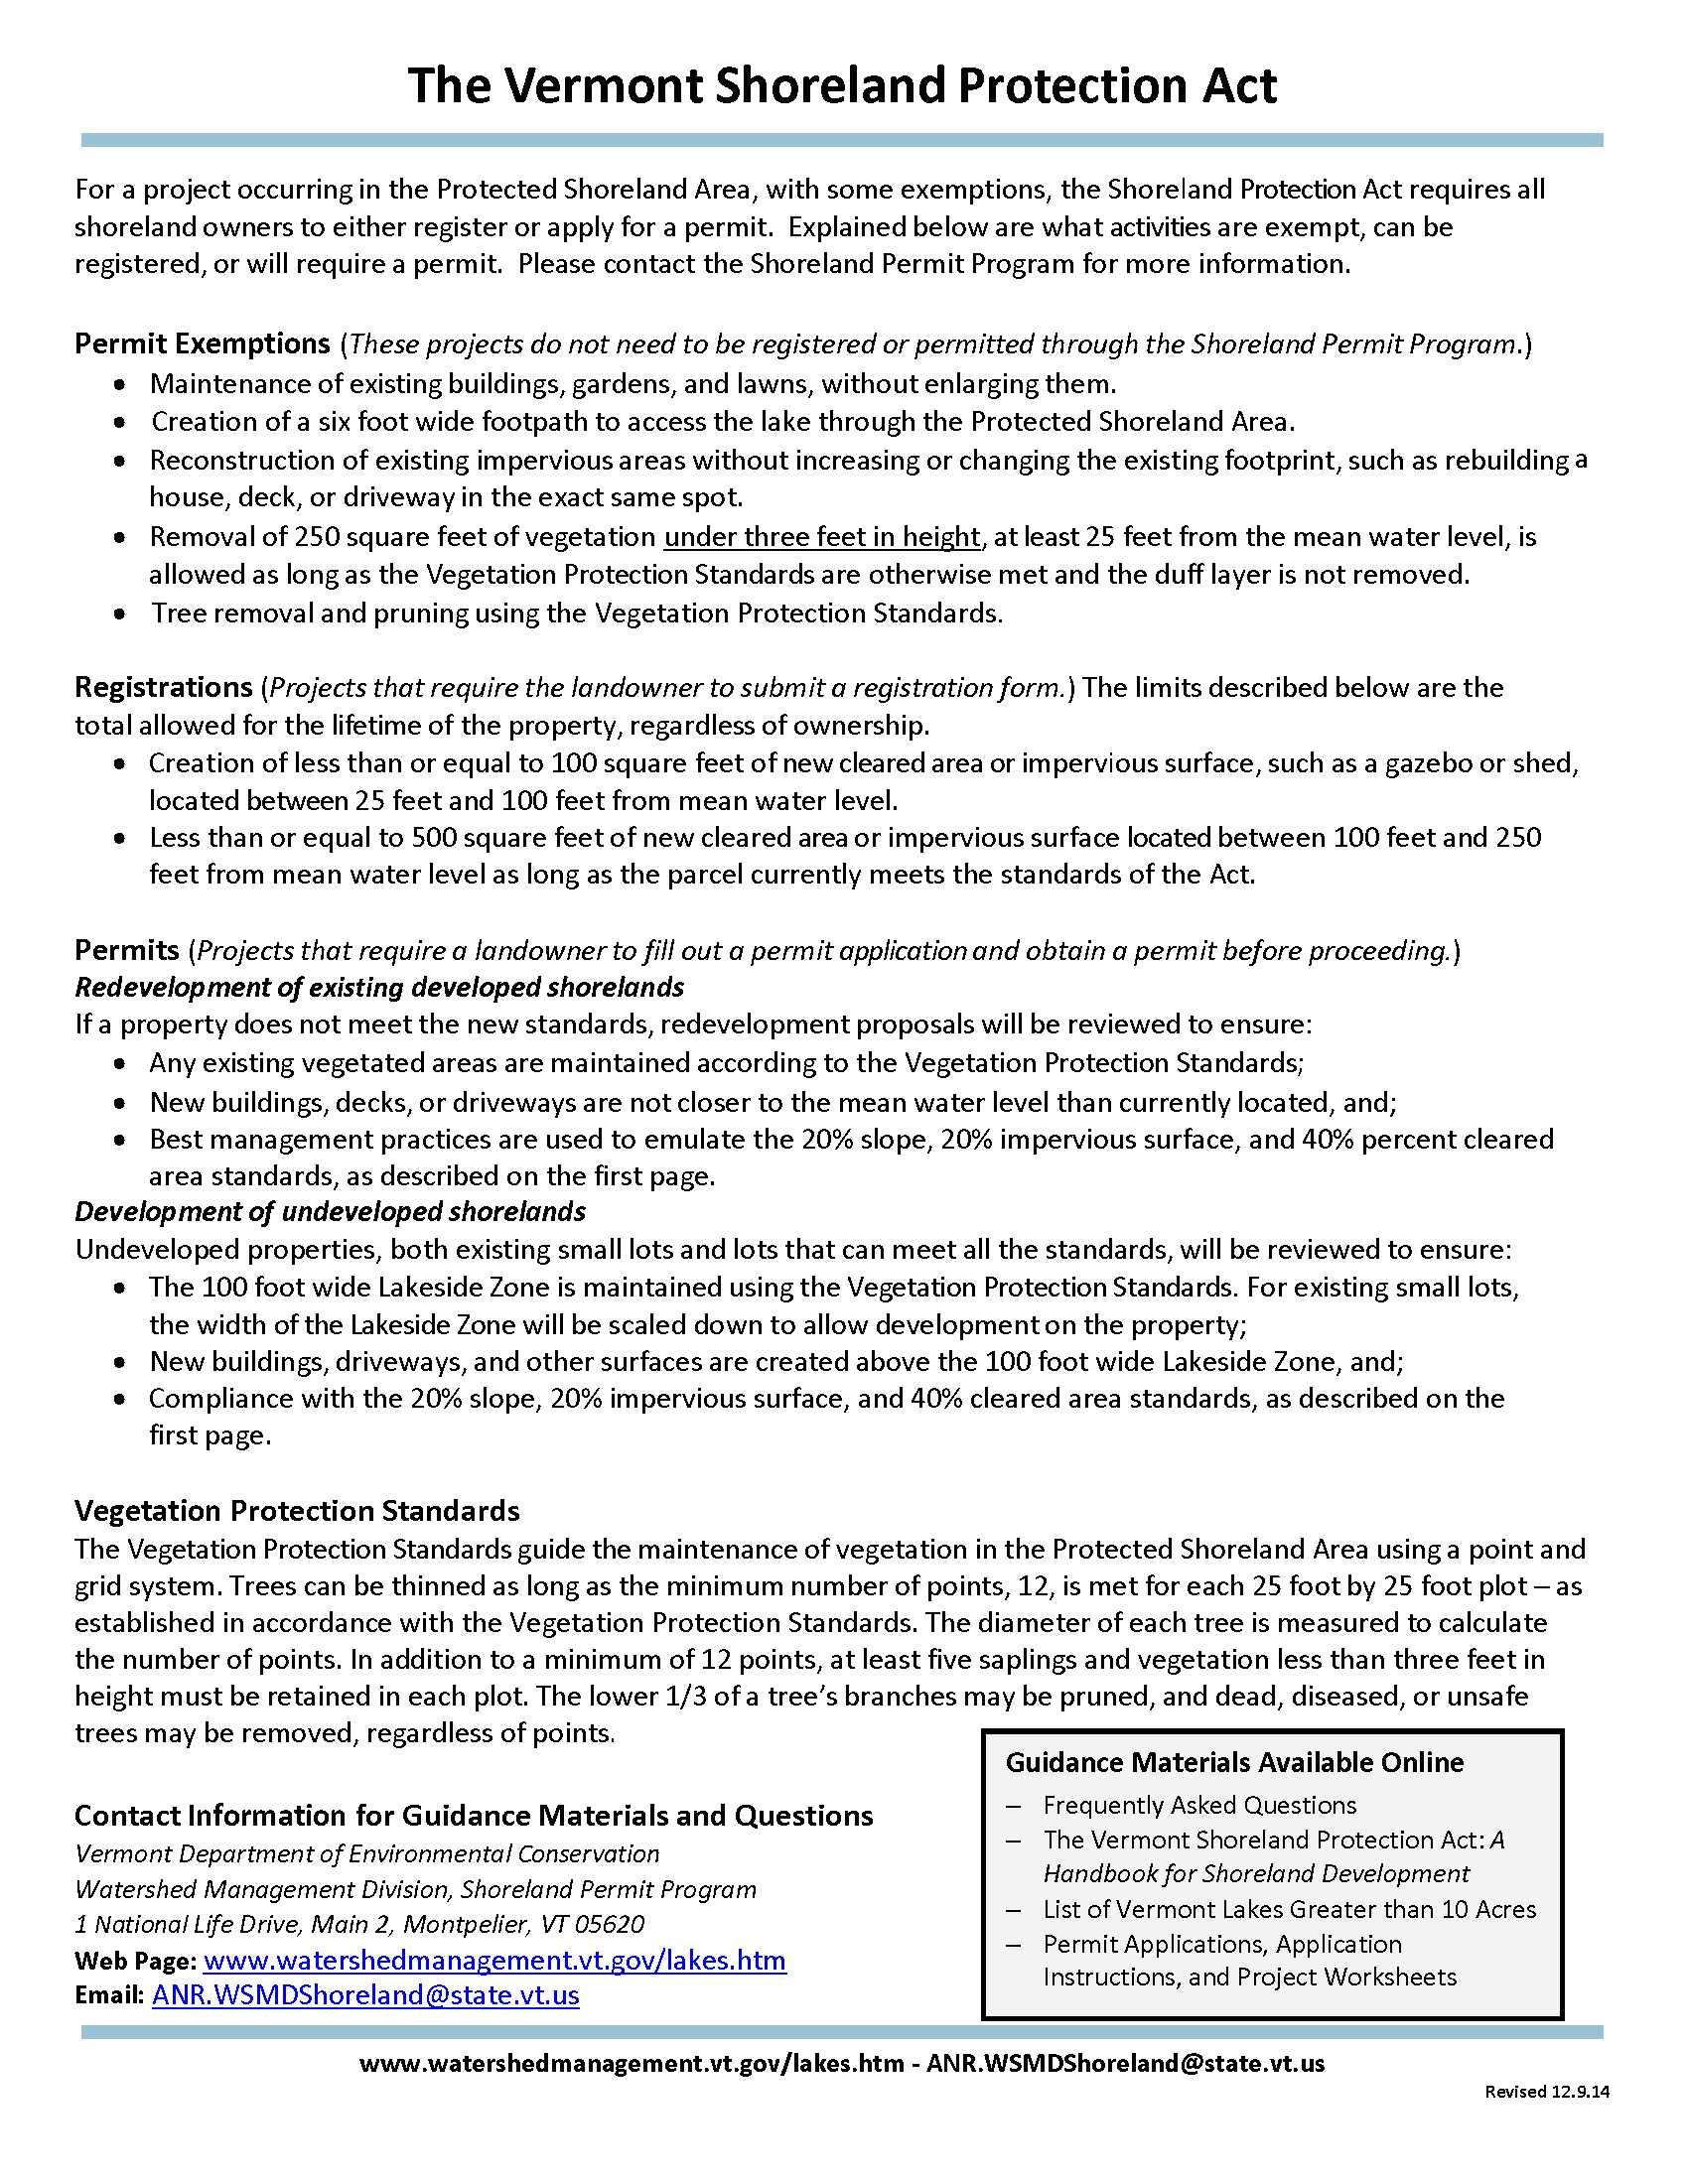 Vermont Shoreland Protection Act Summary_2